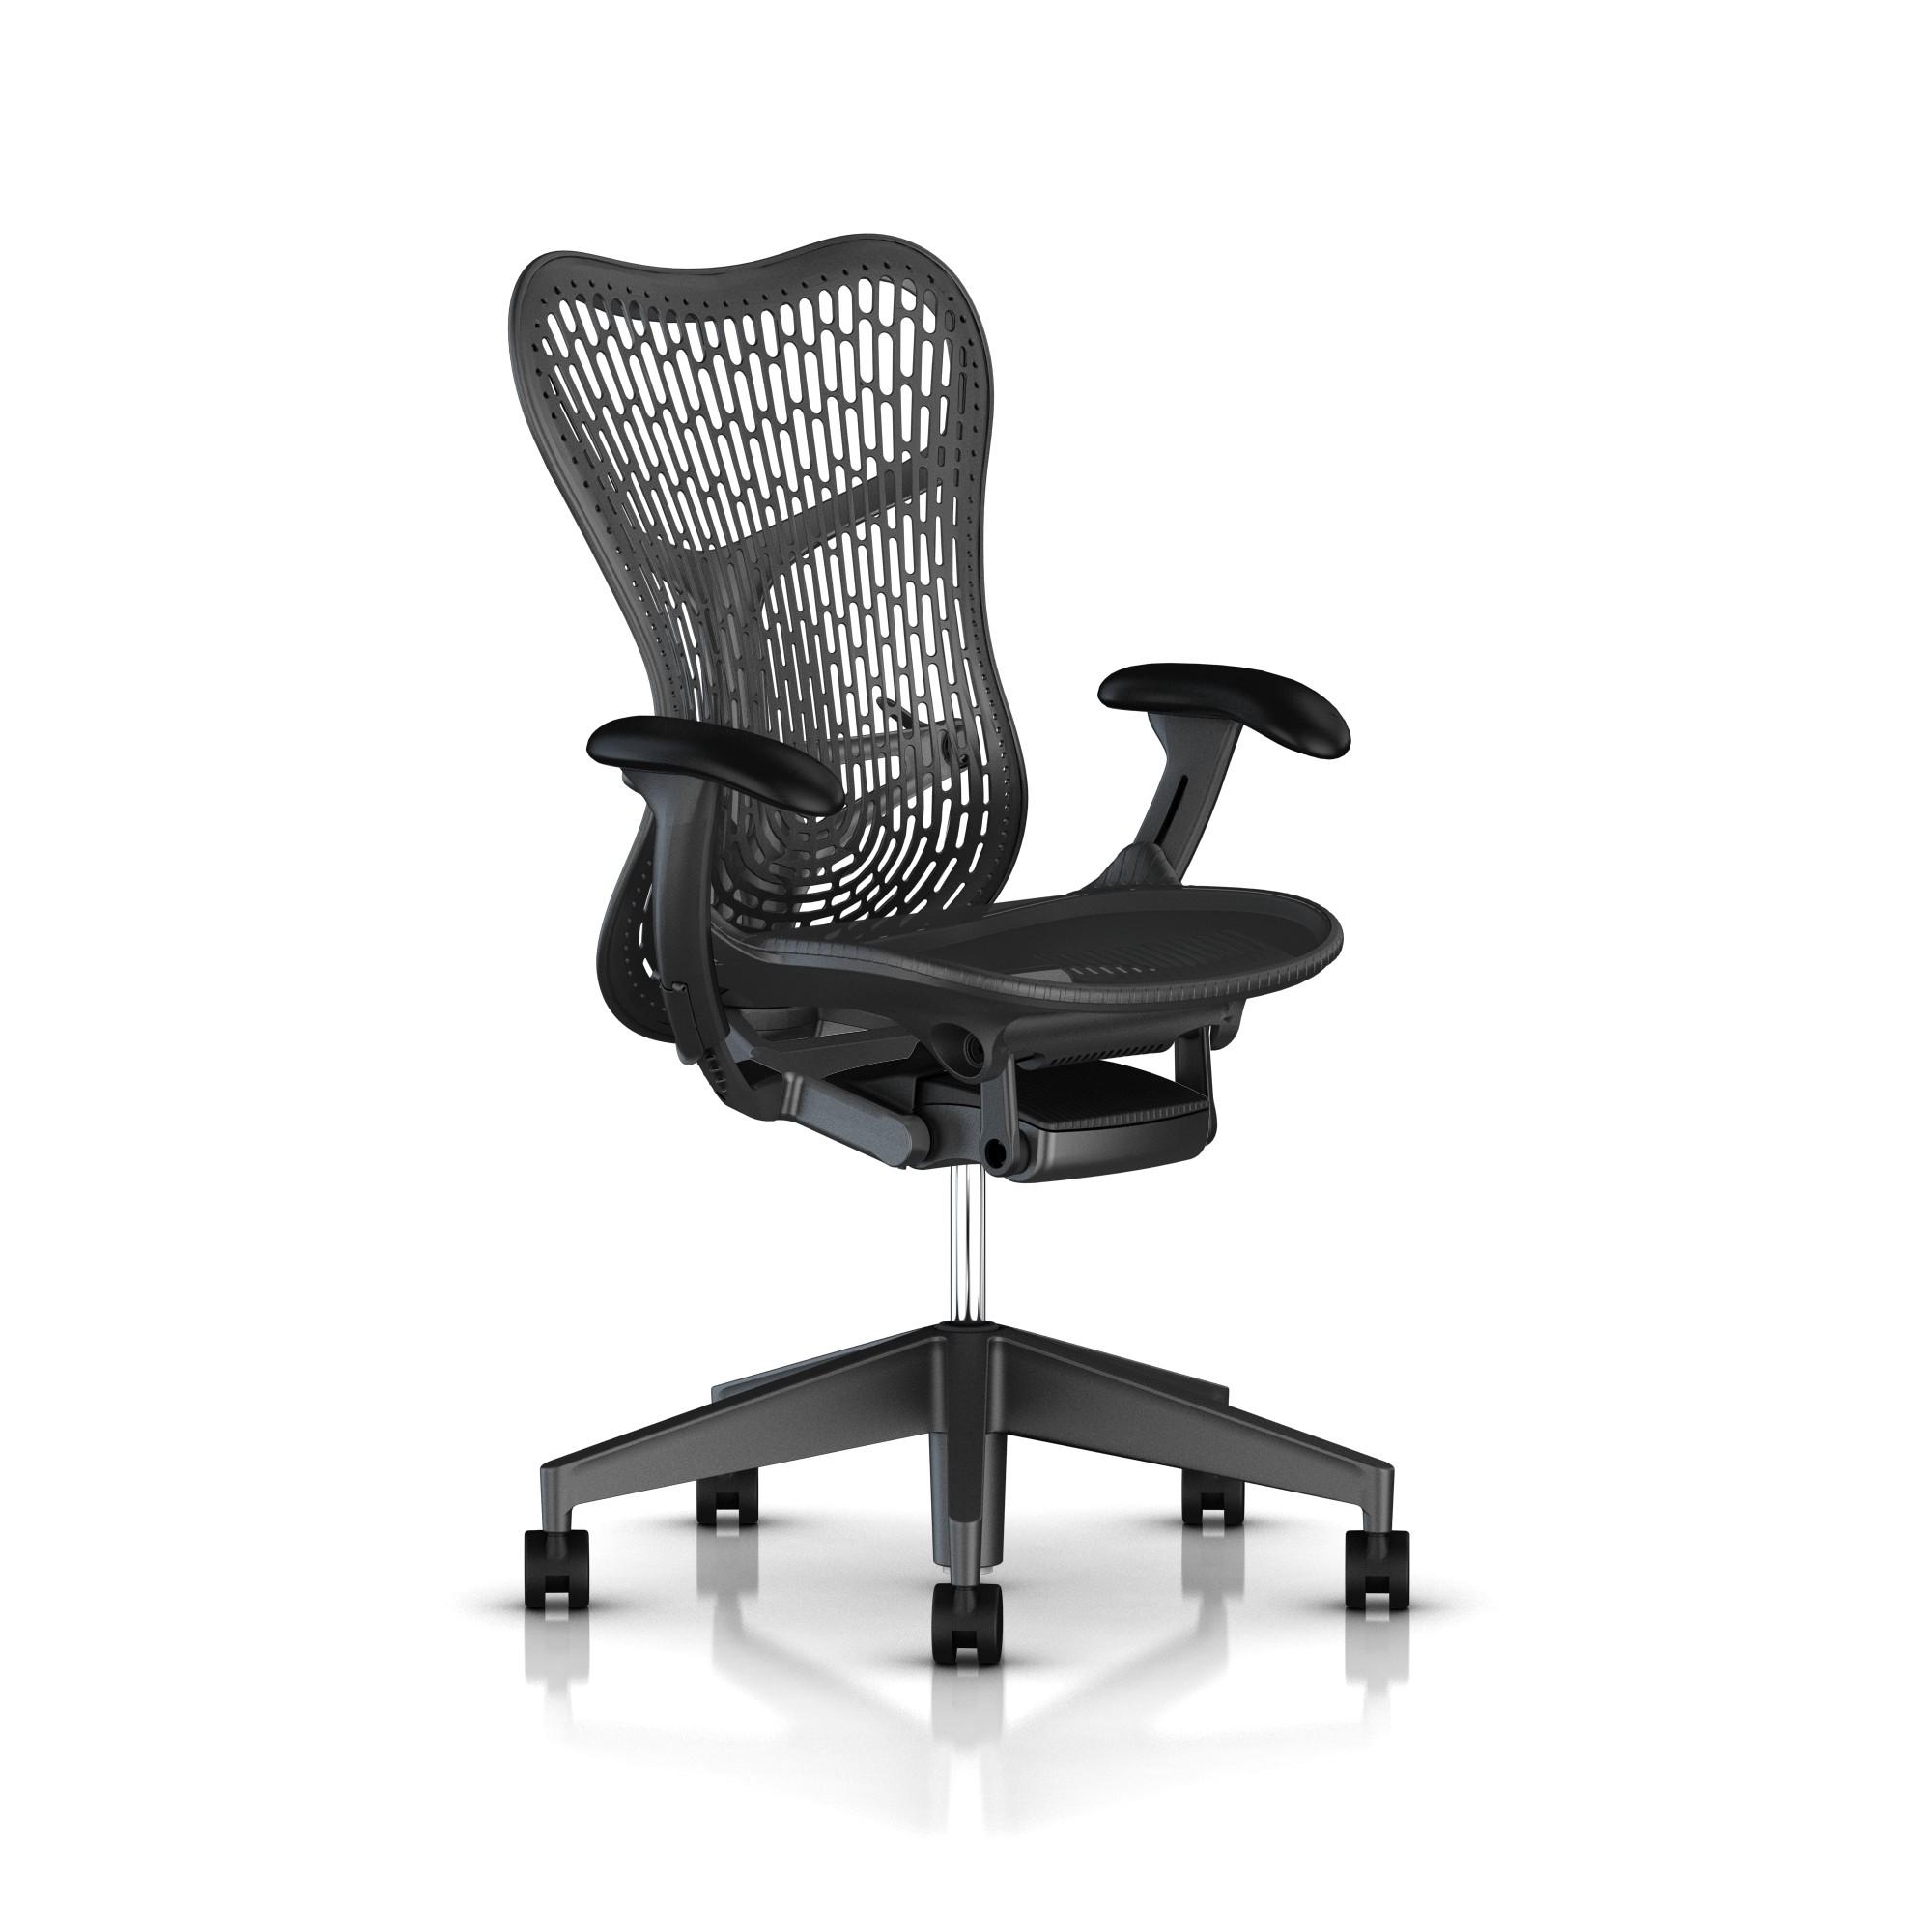 Herman Miller Office Furniture Smart Furniture - Herman miller chair